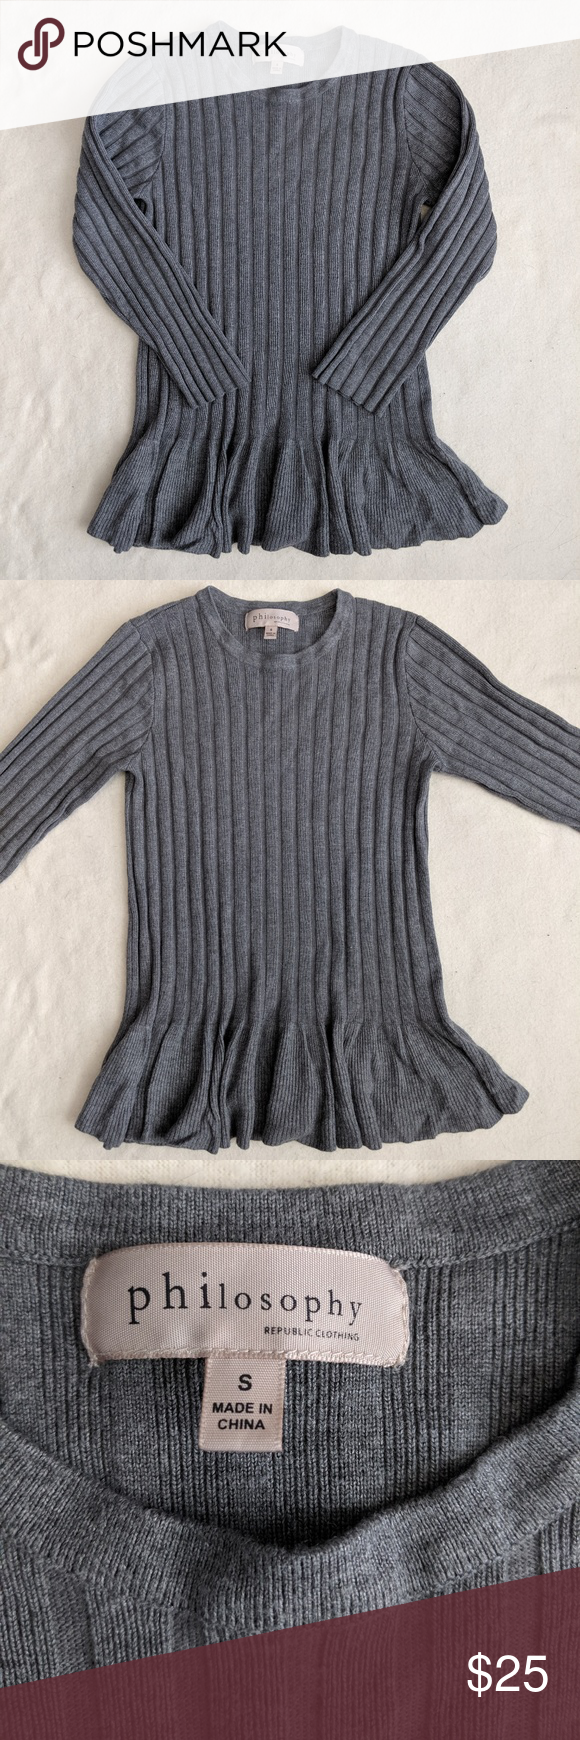 Philosophy Ribbed Ruffle Hem Sweater Philosophy Ribbed Ruffle Hem Gray Sweater Size Small Such A Cute Sweater W Ruffle Hem Sweater Cute Sweaters Grey Sweater